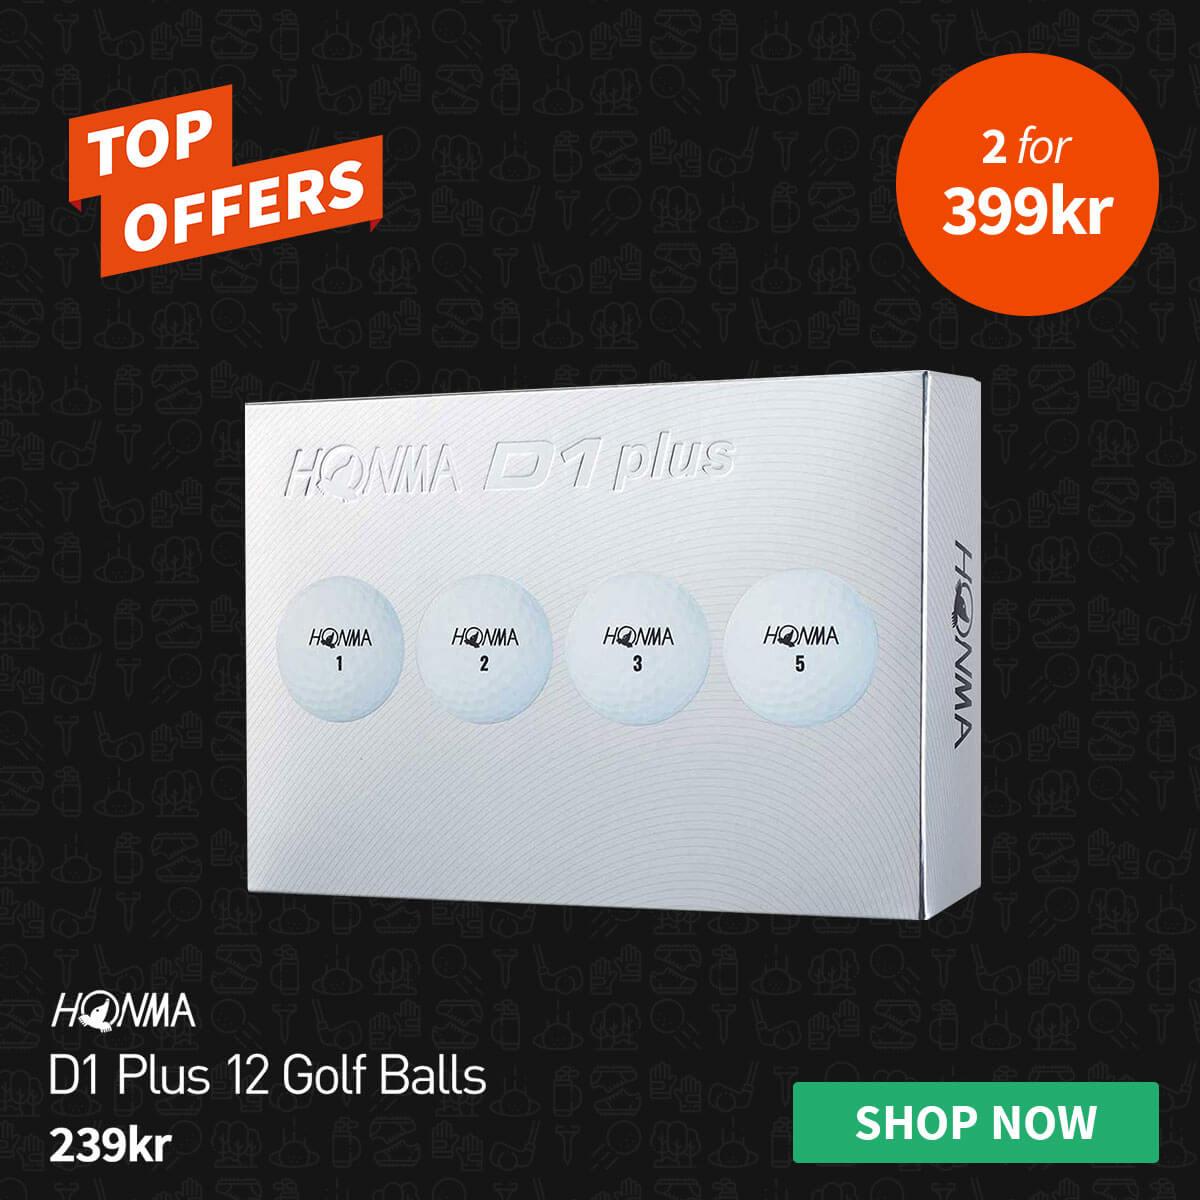 TOP OFFERS - HONMA D1 BALLS